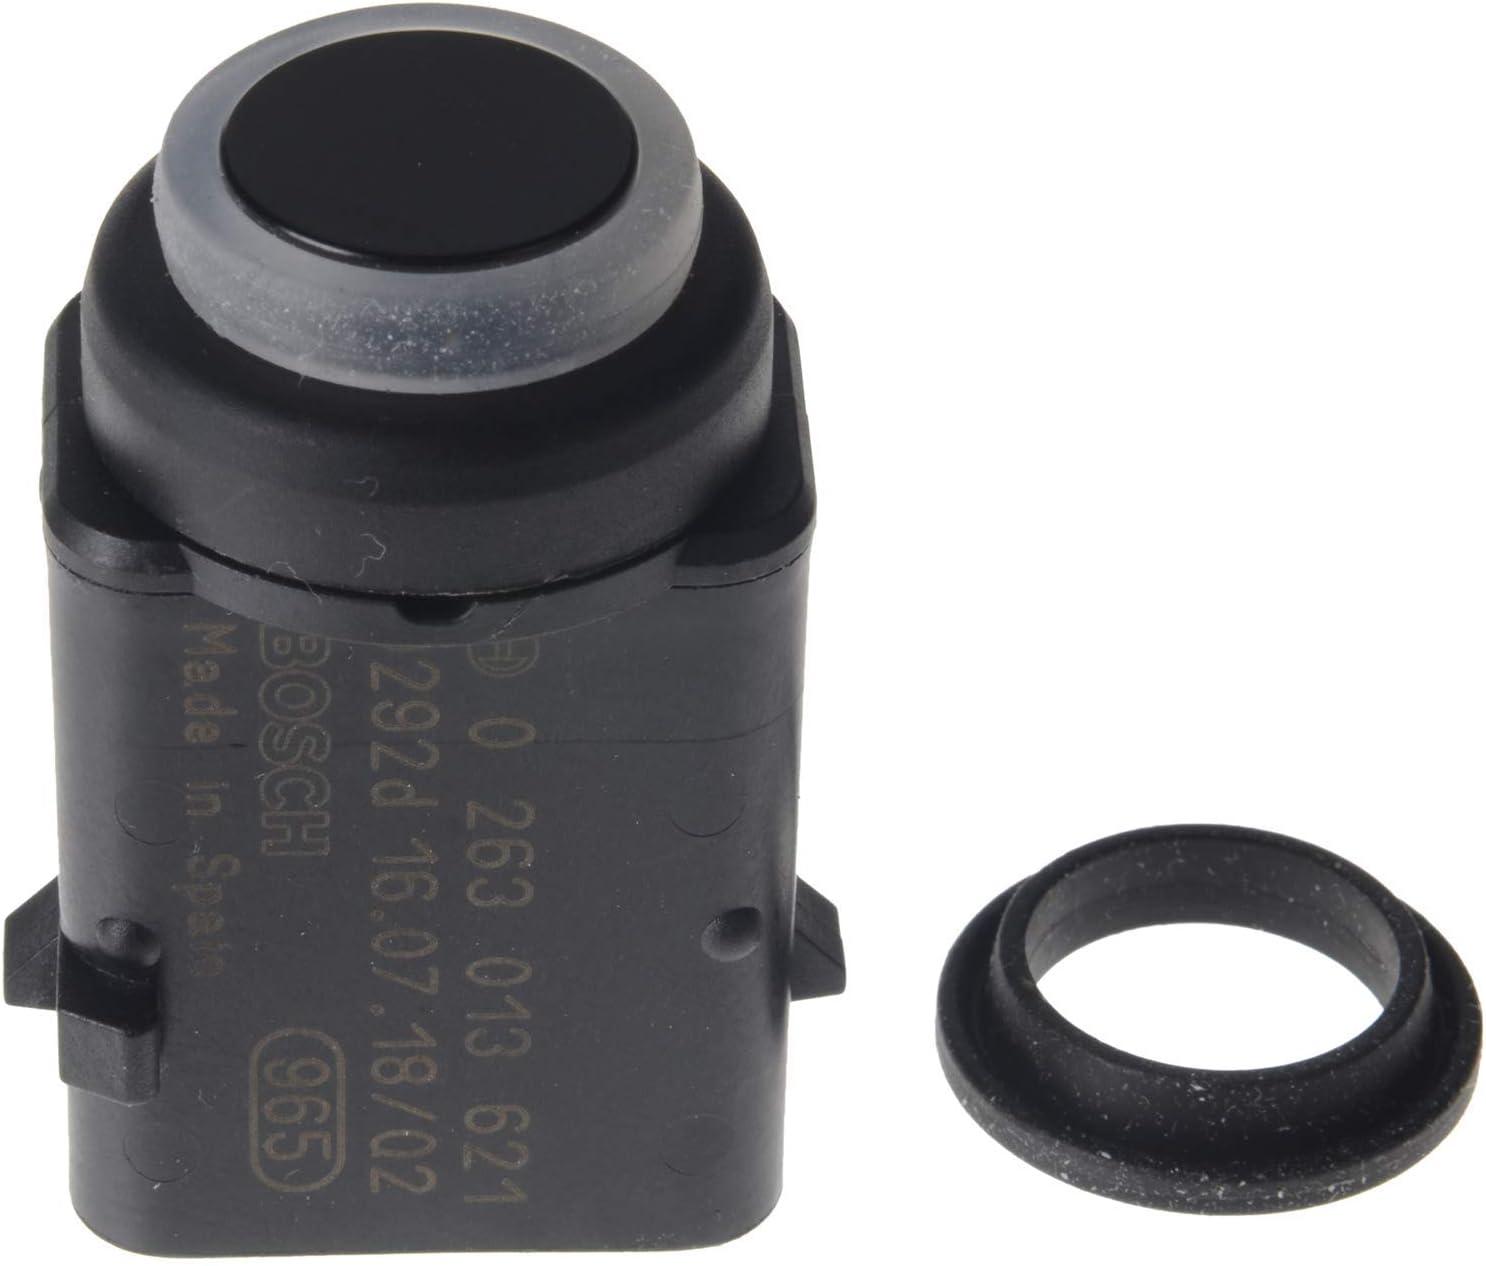 Bosch 0 263 009 588 Sensor Einparkhilfe Auto